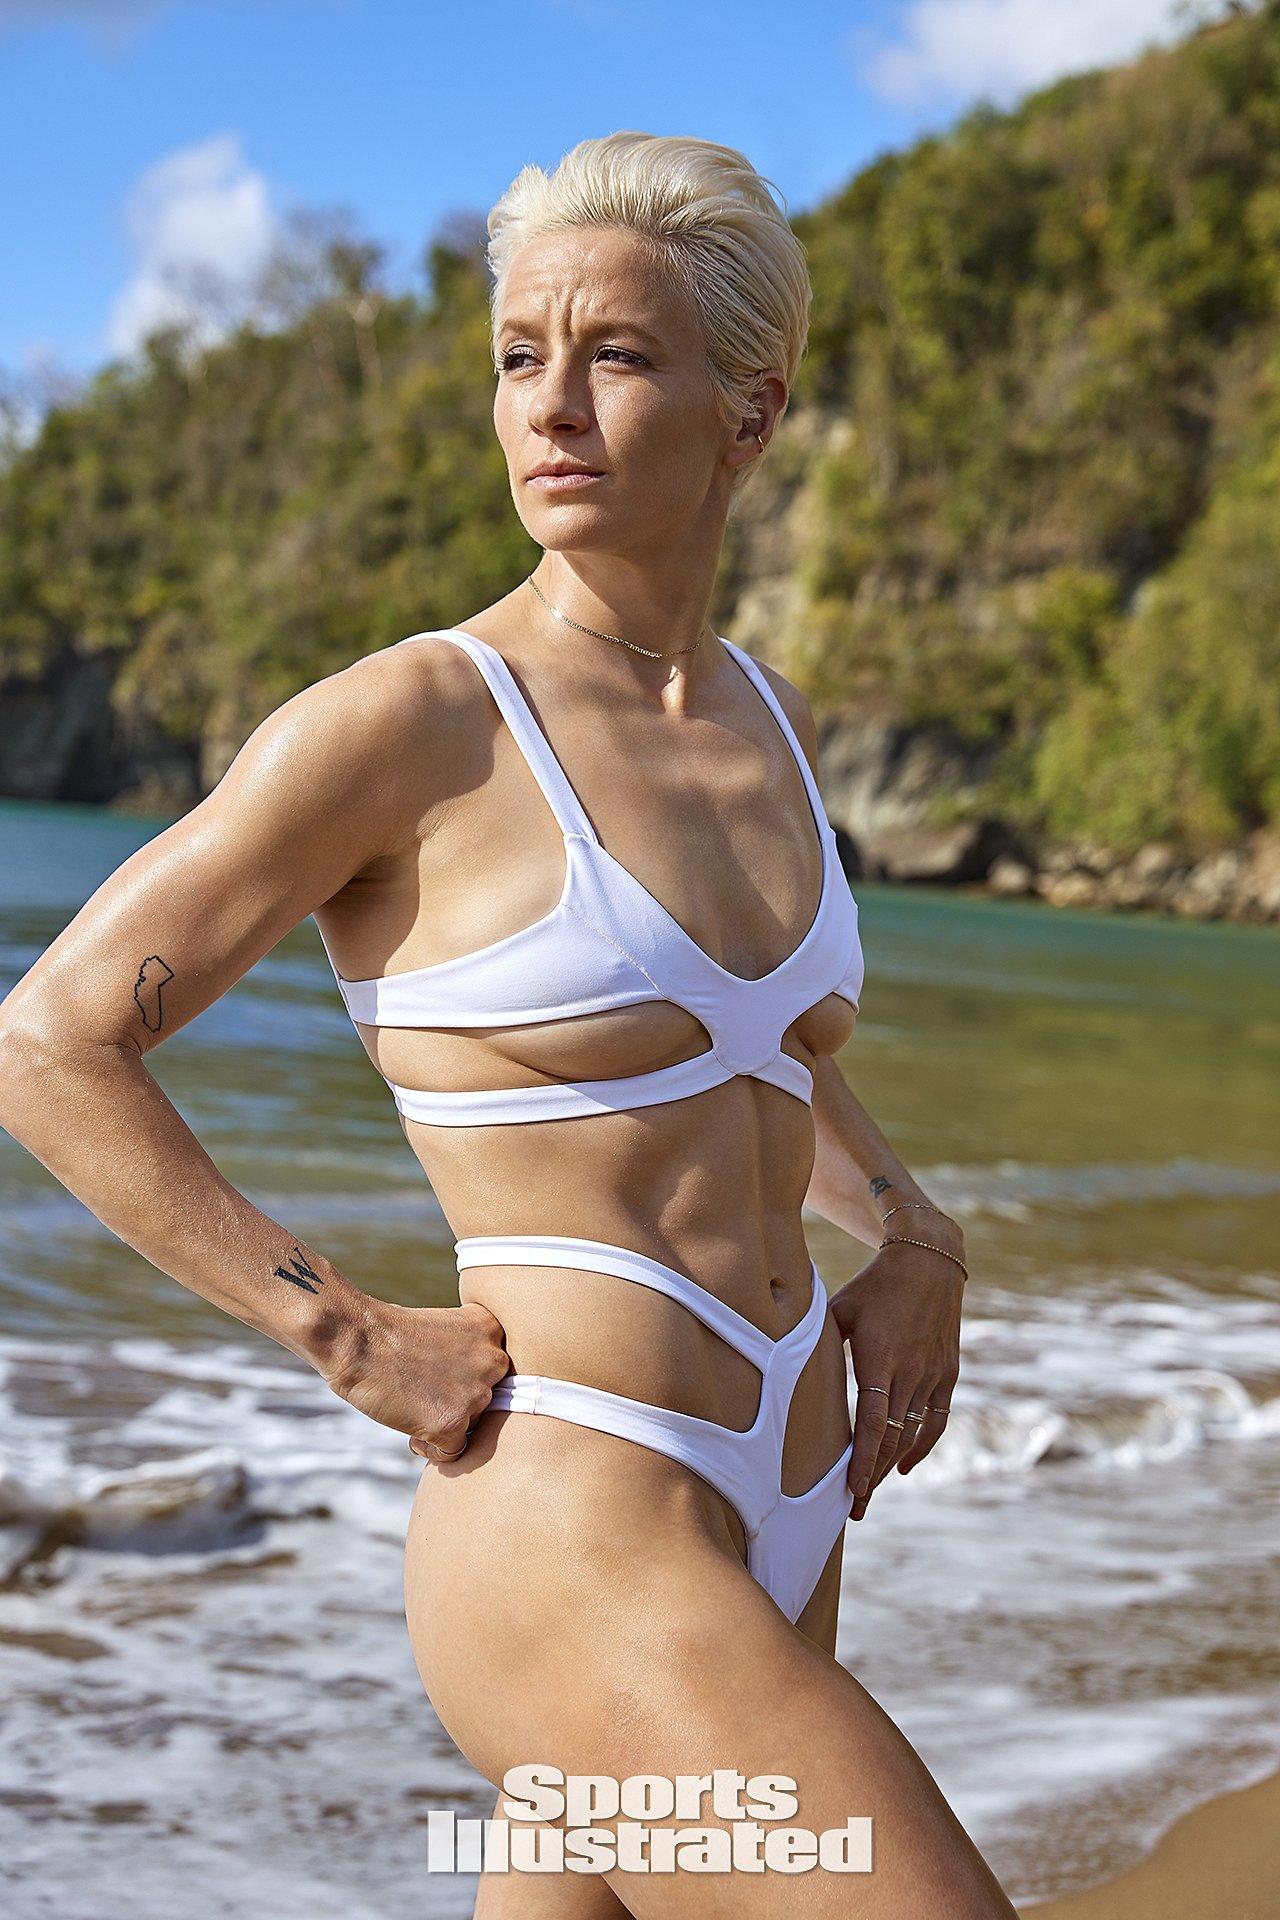 banner transparent Si swimsuit us women. Bikini transparent reddit